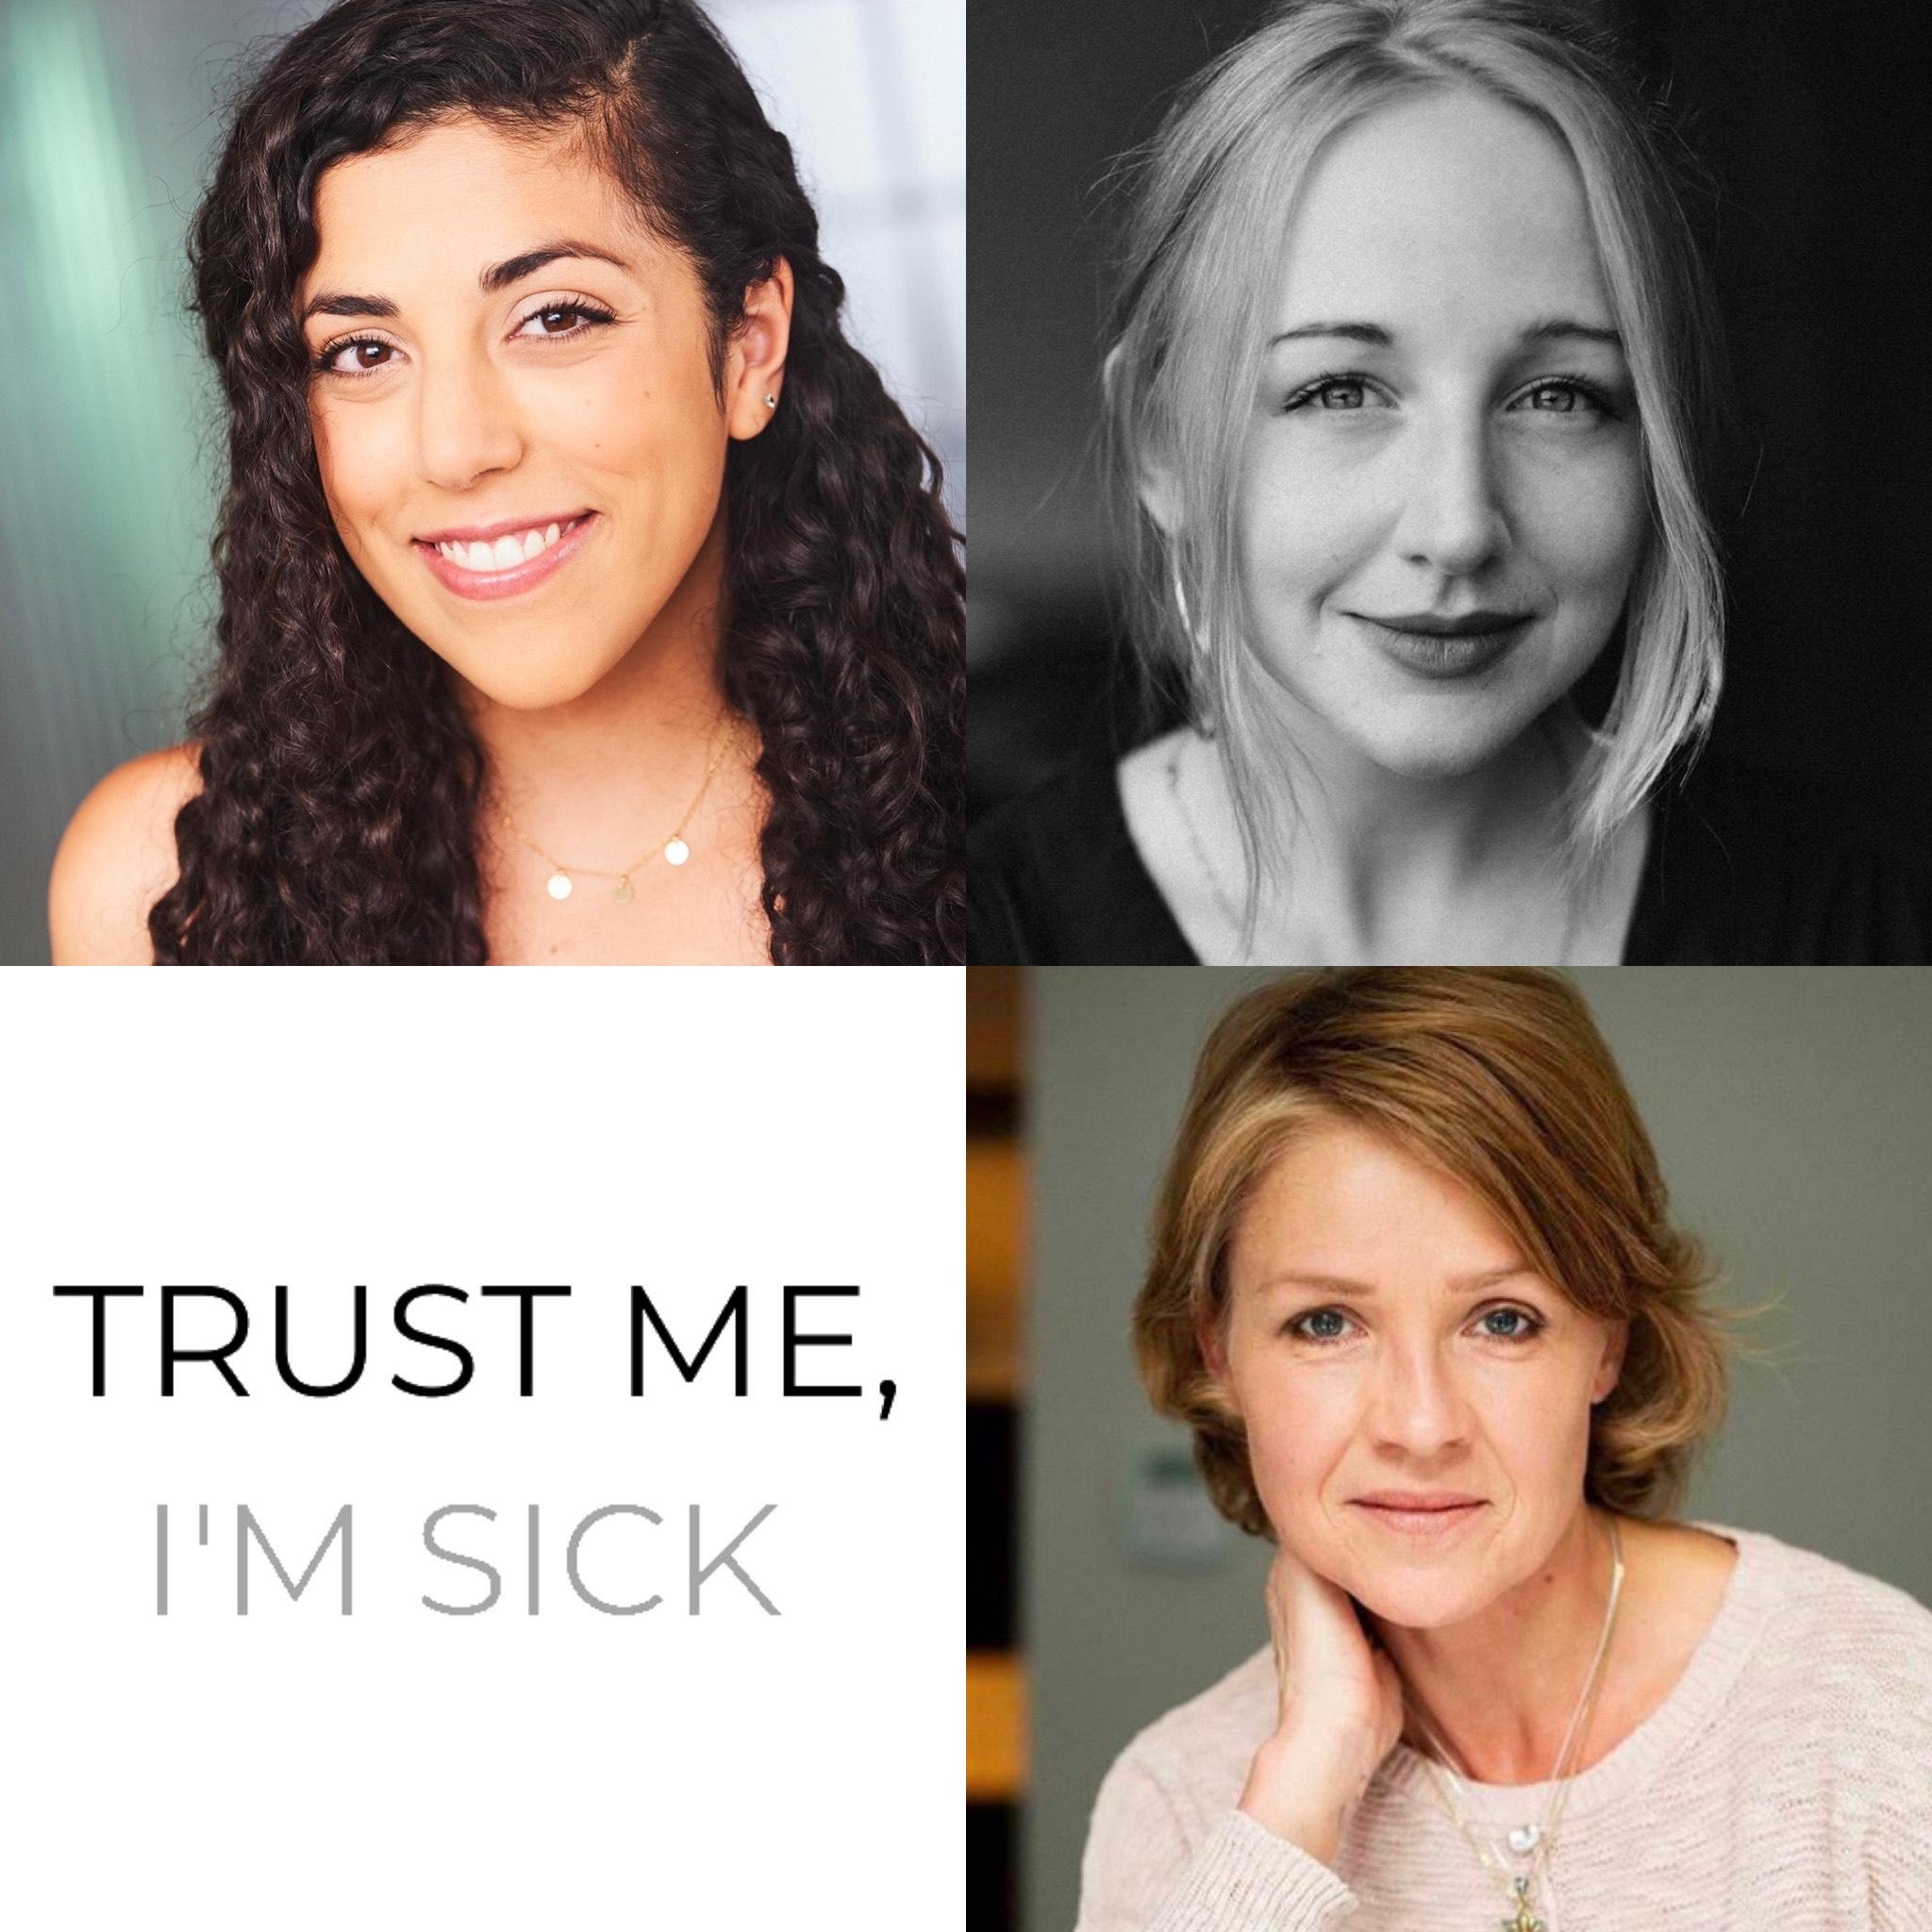 Trust Me, I'm Sick Erica Lupinacci Sarah Stewart Henriette Ivanans-McIntyre Uninvisible Pod UP lupus SIBO addiction alcoholism kidney disease transplant